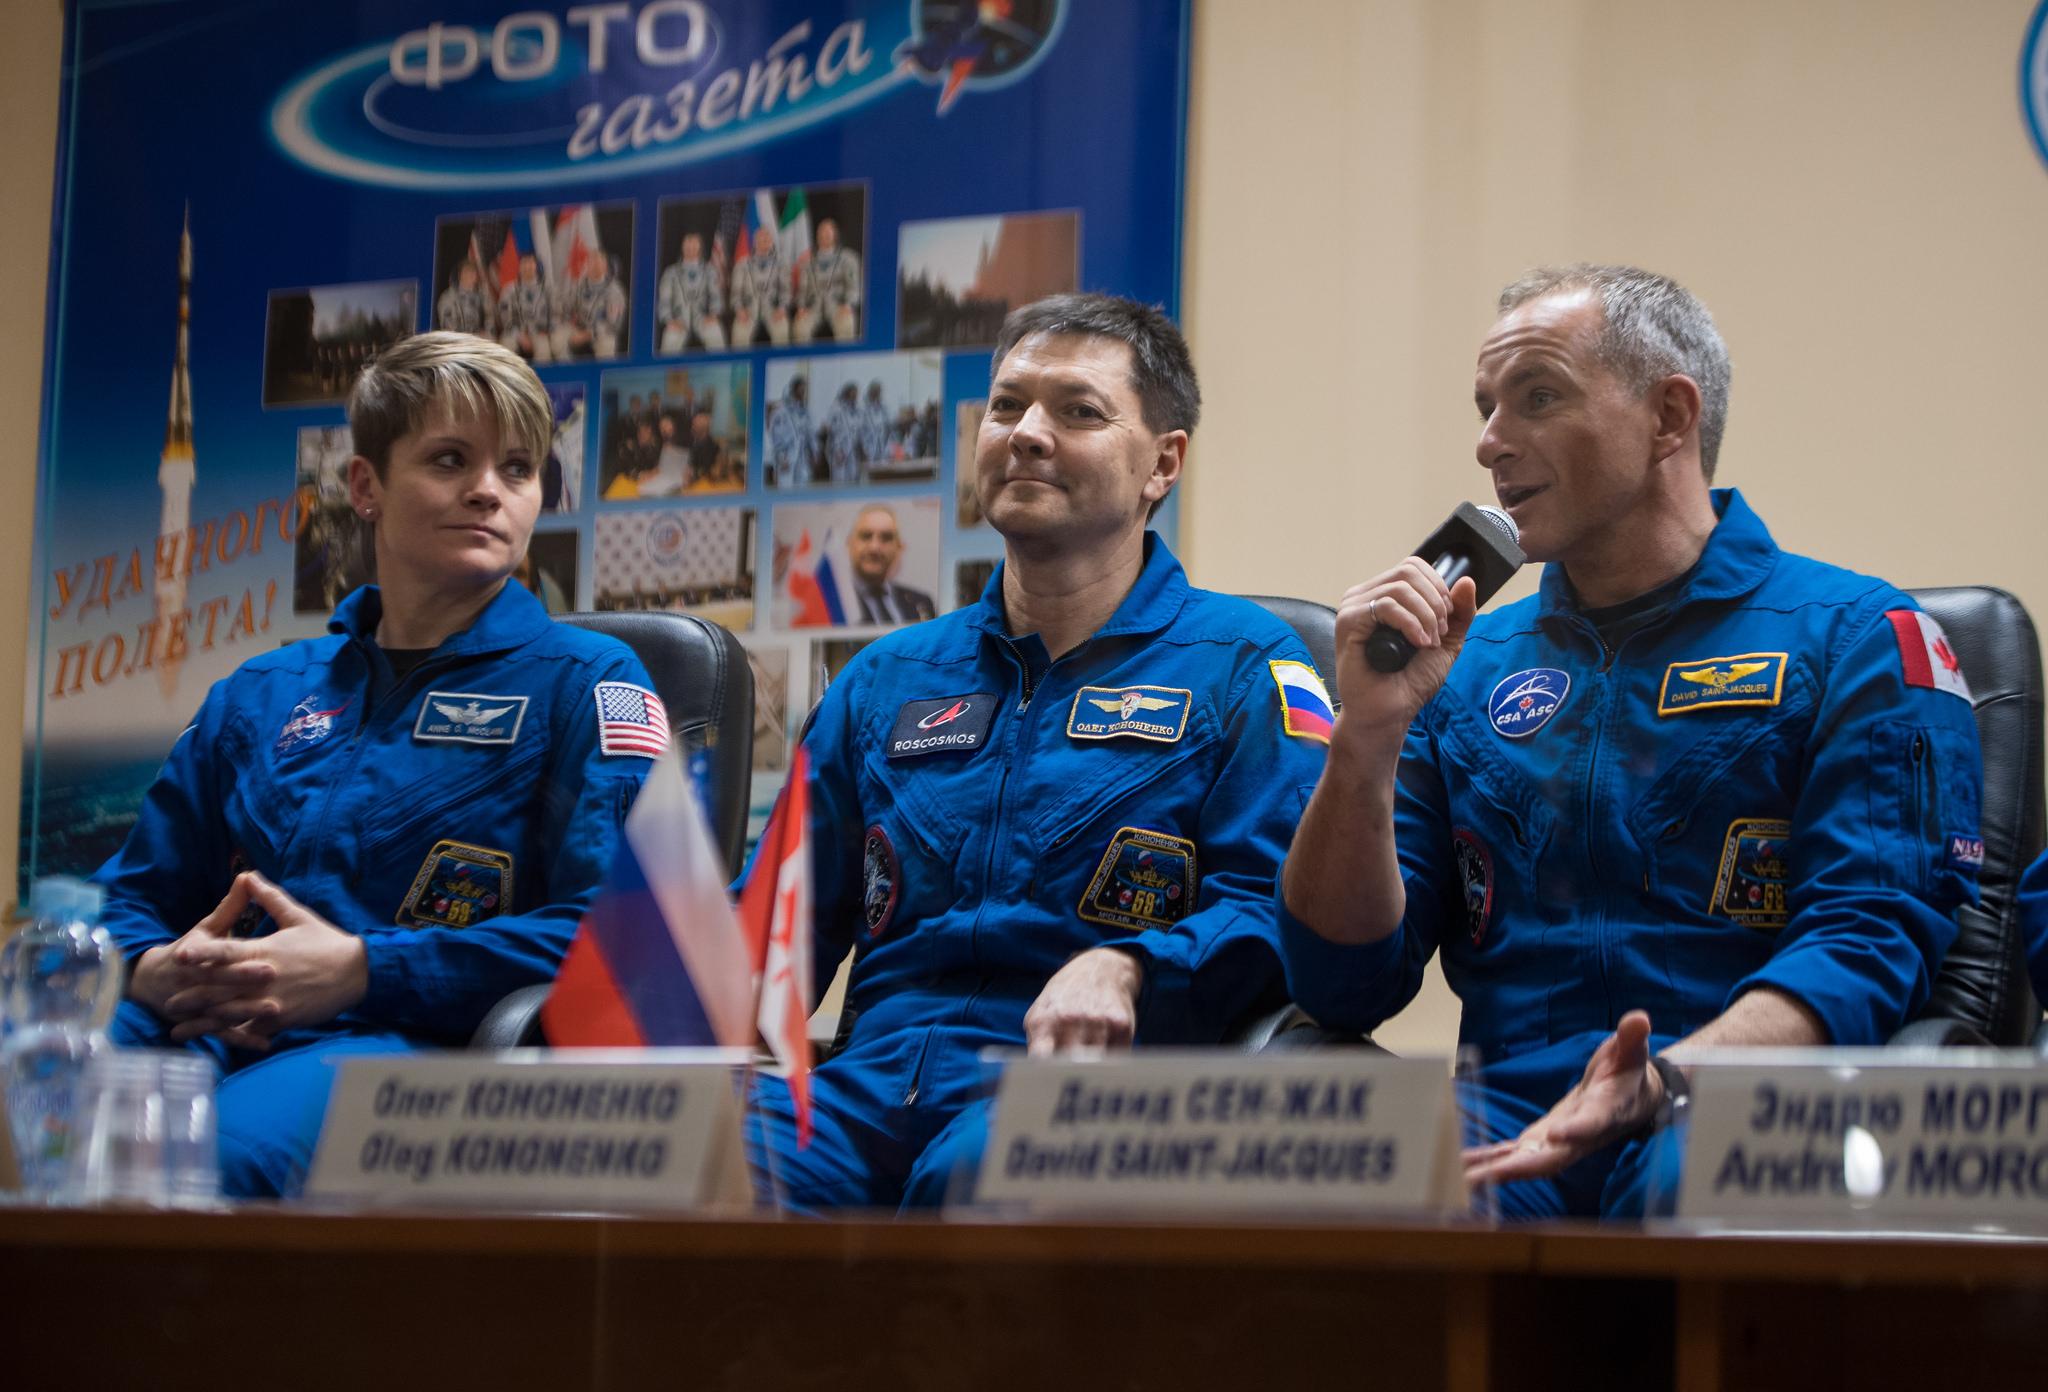 NASA astronaut Anne McClain, left, Russian cosmonaut Oleg Kononenko, center, and Canadian Space Agency astronaut David Saint-Jacques answer questions during a pre-launch press conference. Credit: NASA/Aubrey Gemignani